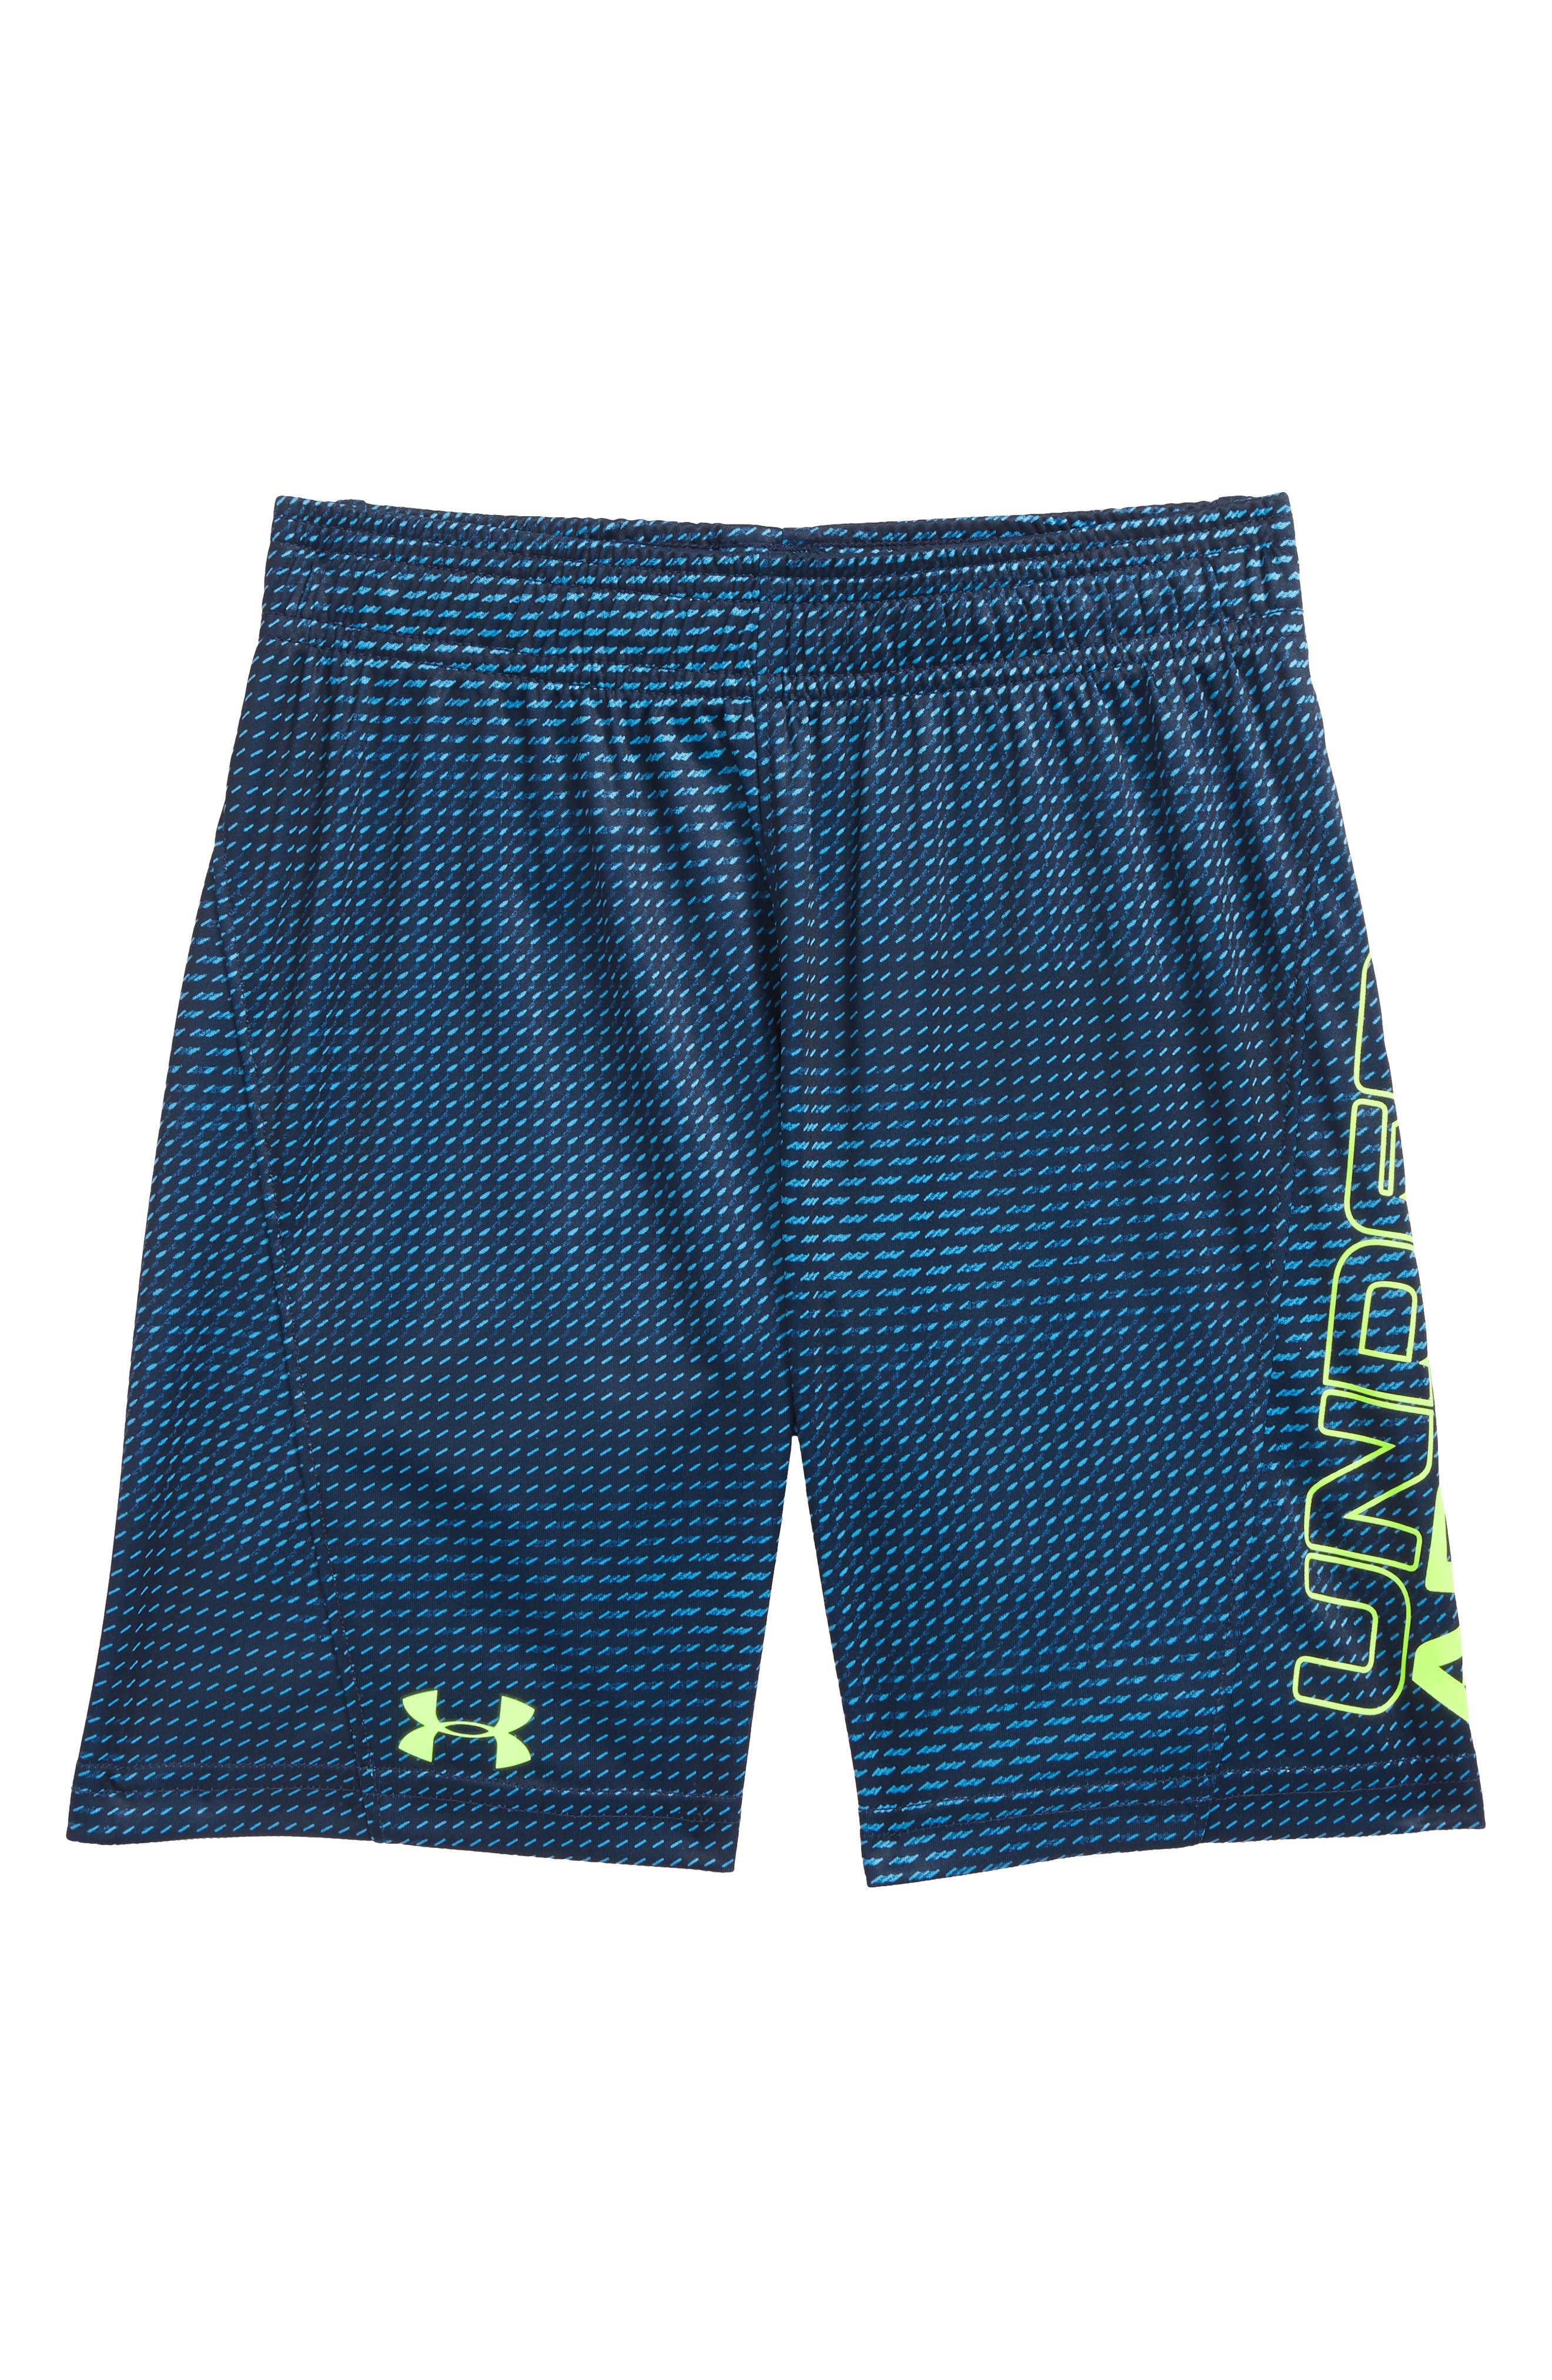 Sync Boost HeatGear<sup>®</sup> Shorts,                         Main,                         color, Canoe Blue